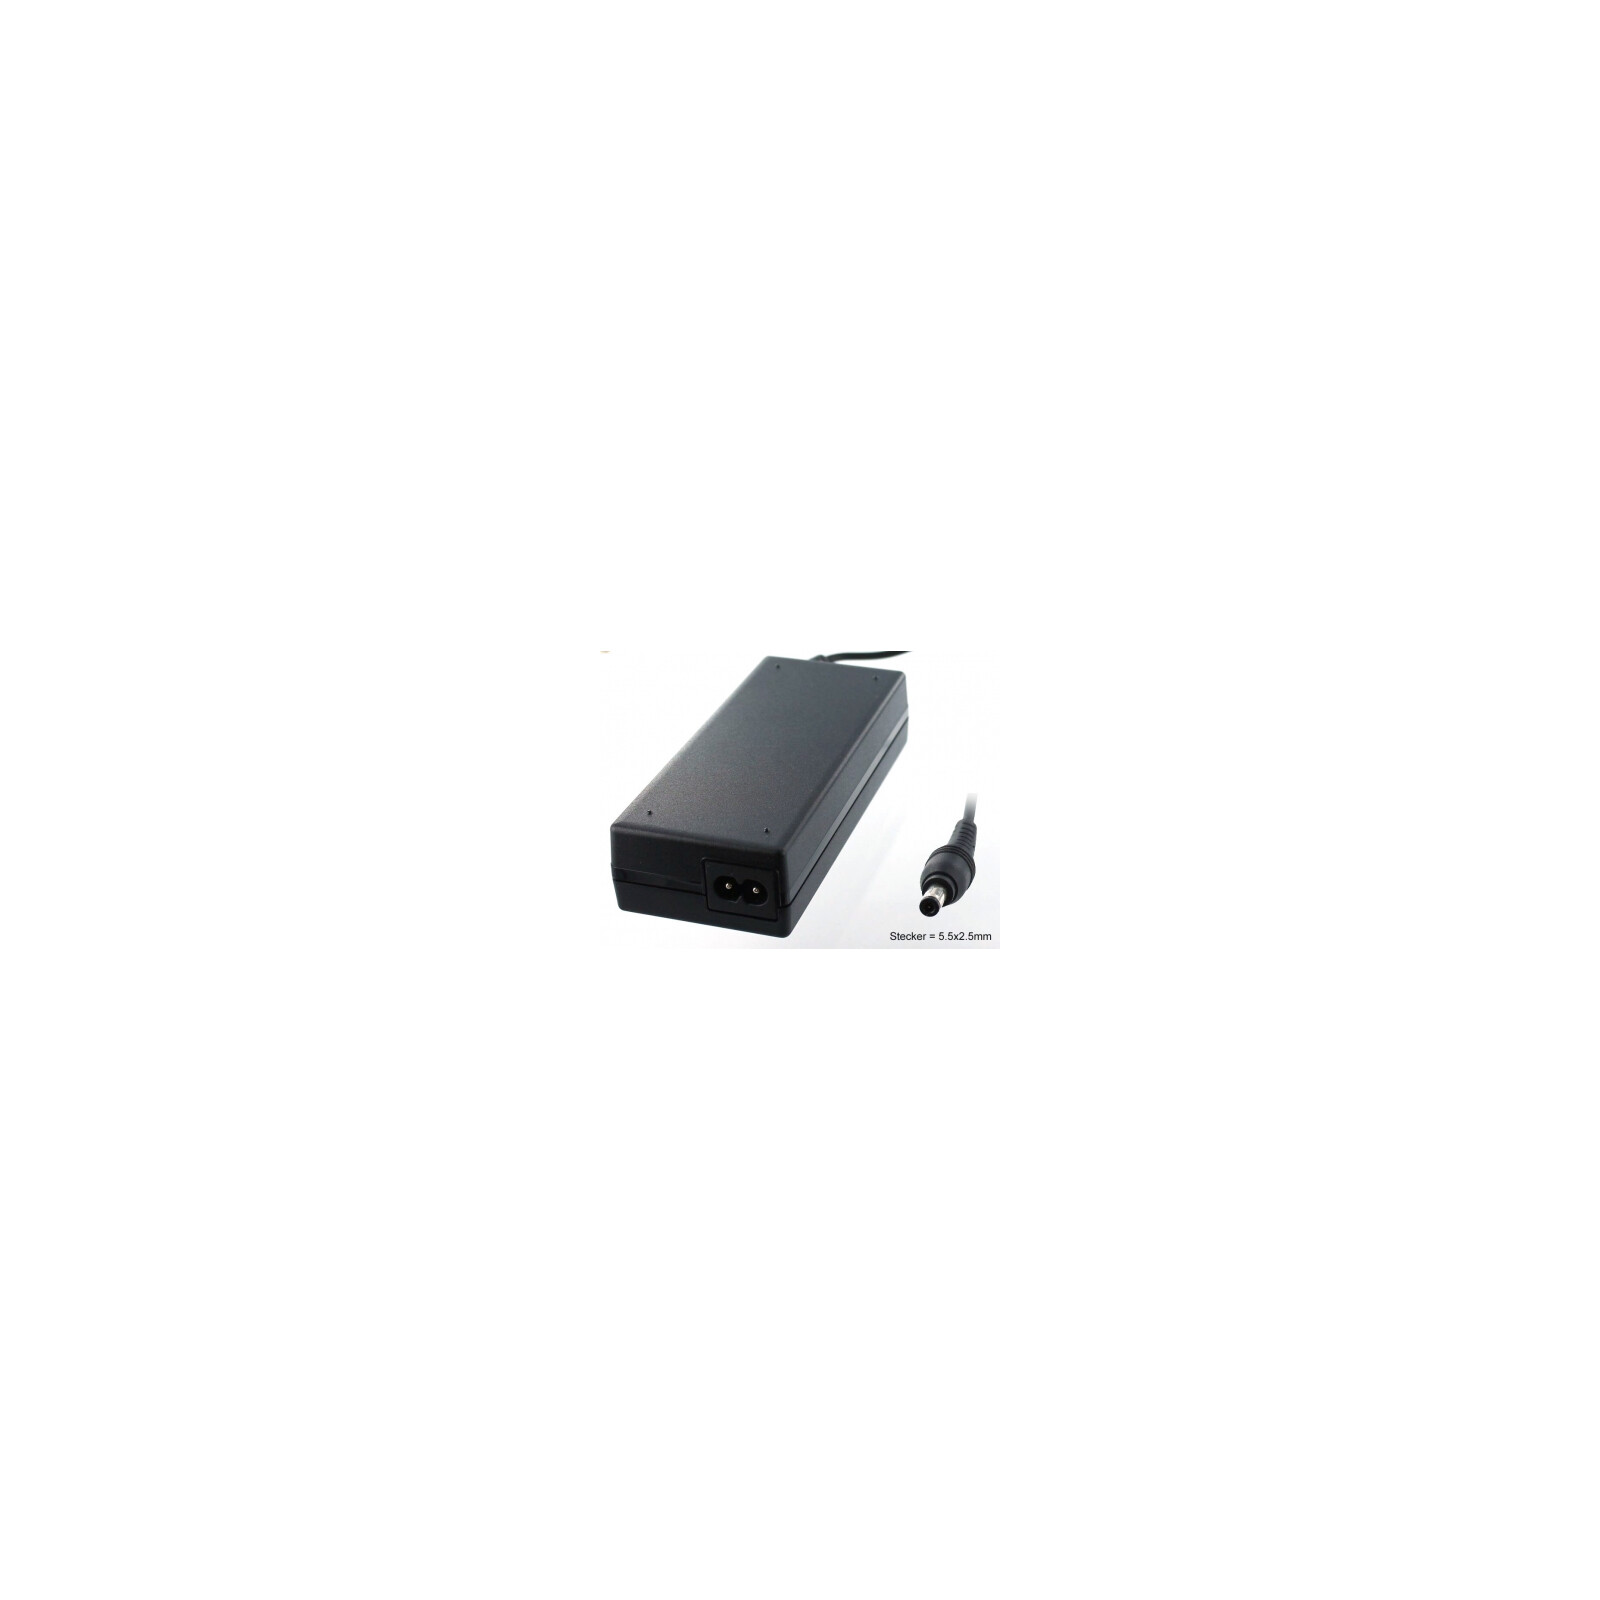 AGI Netzteil Acer Aspire 1350 90W